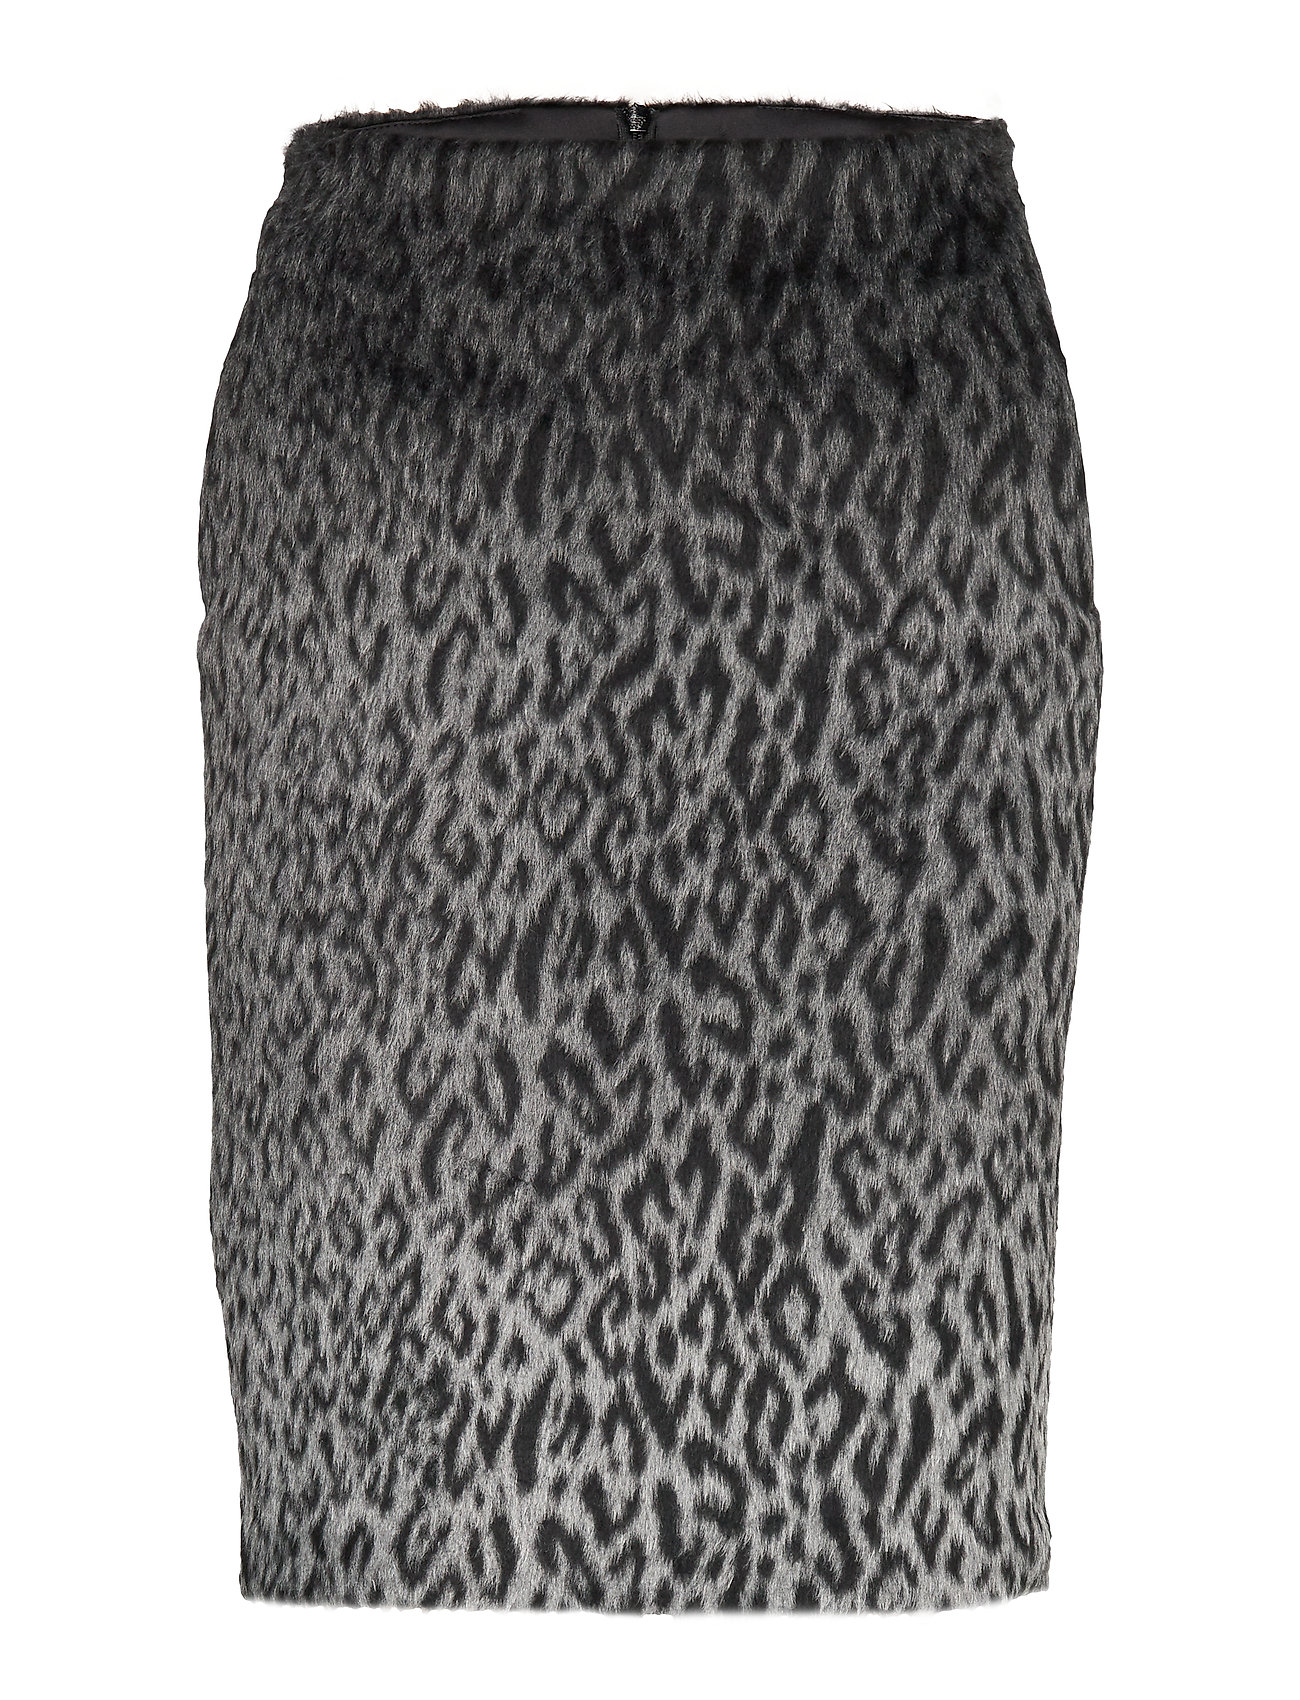 Karl Lagerfeld Karl X Carine Leopard Skirt - BLACK/GRAY